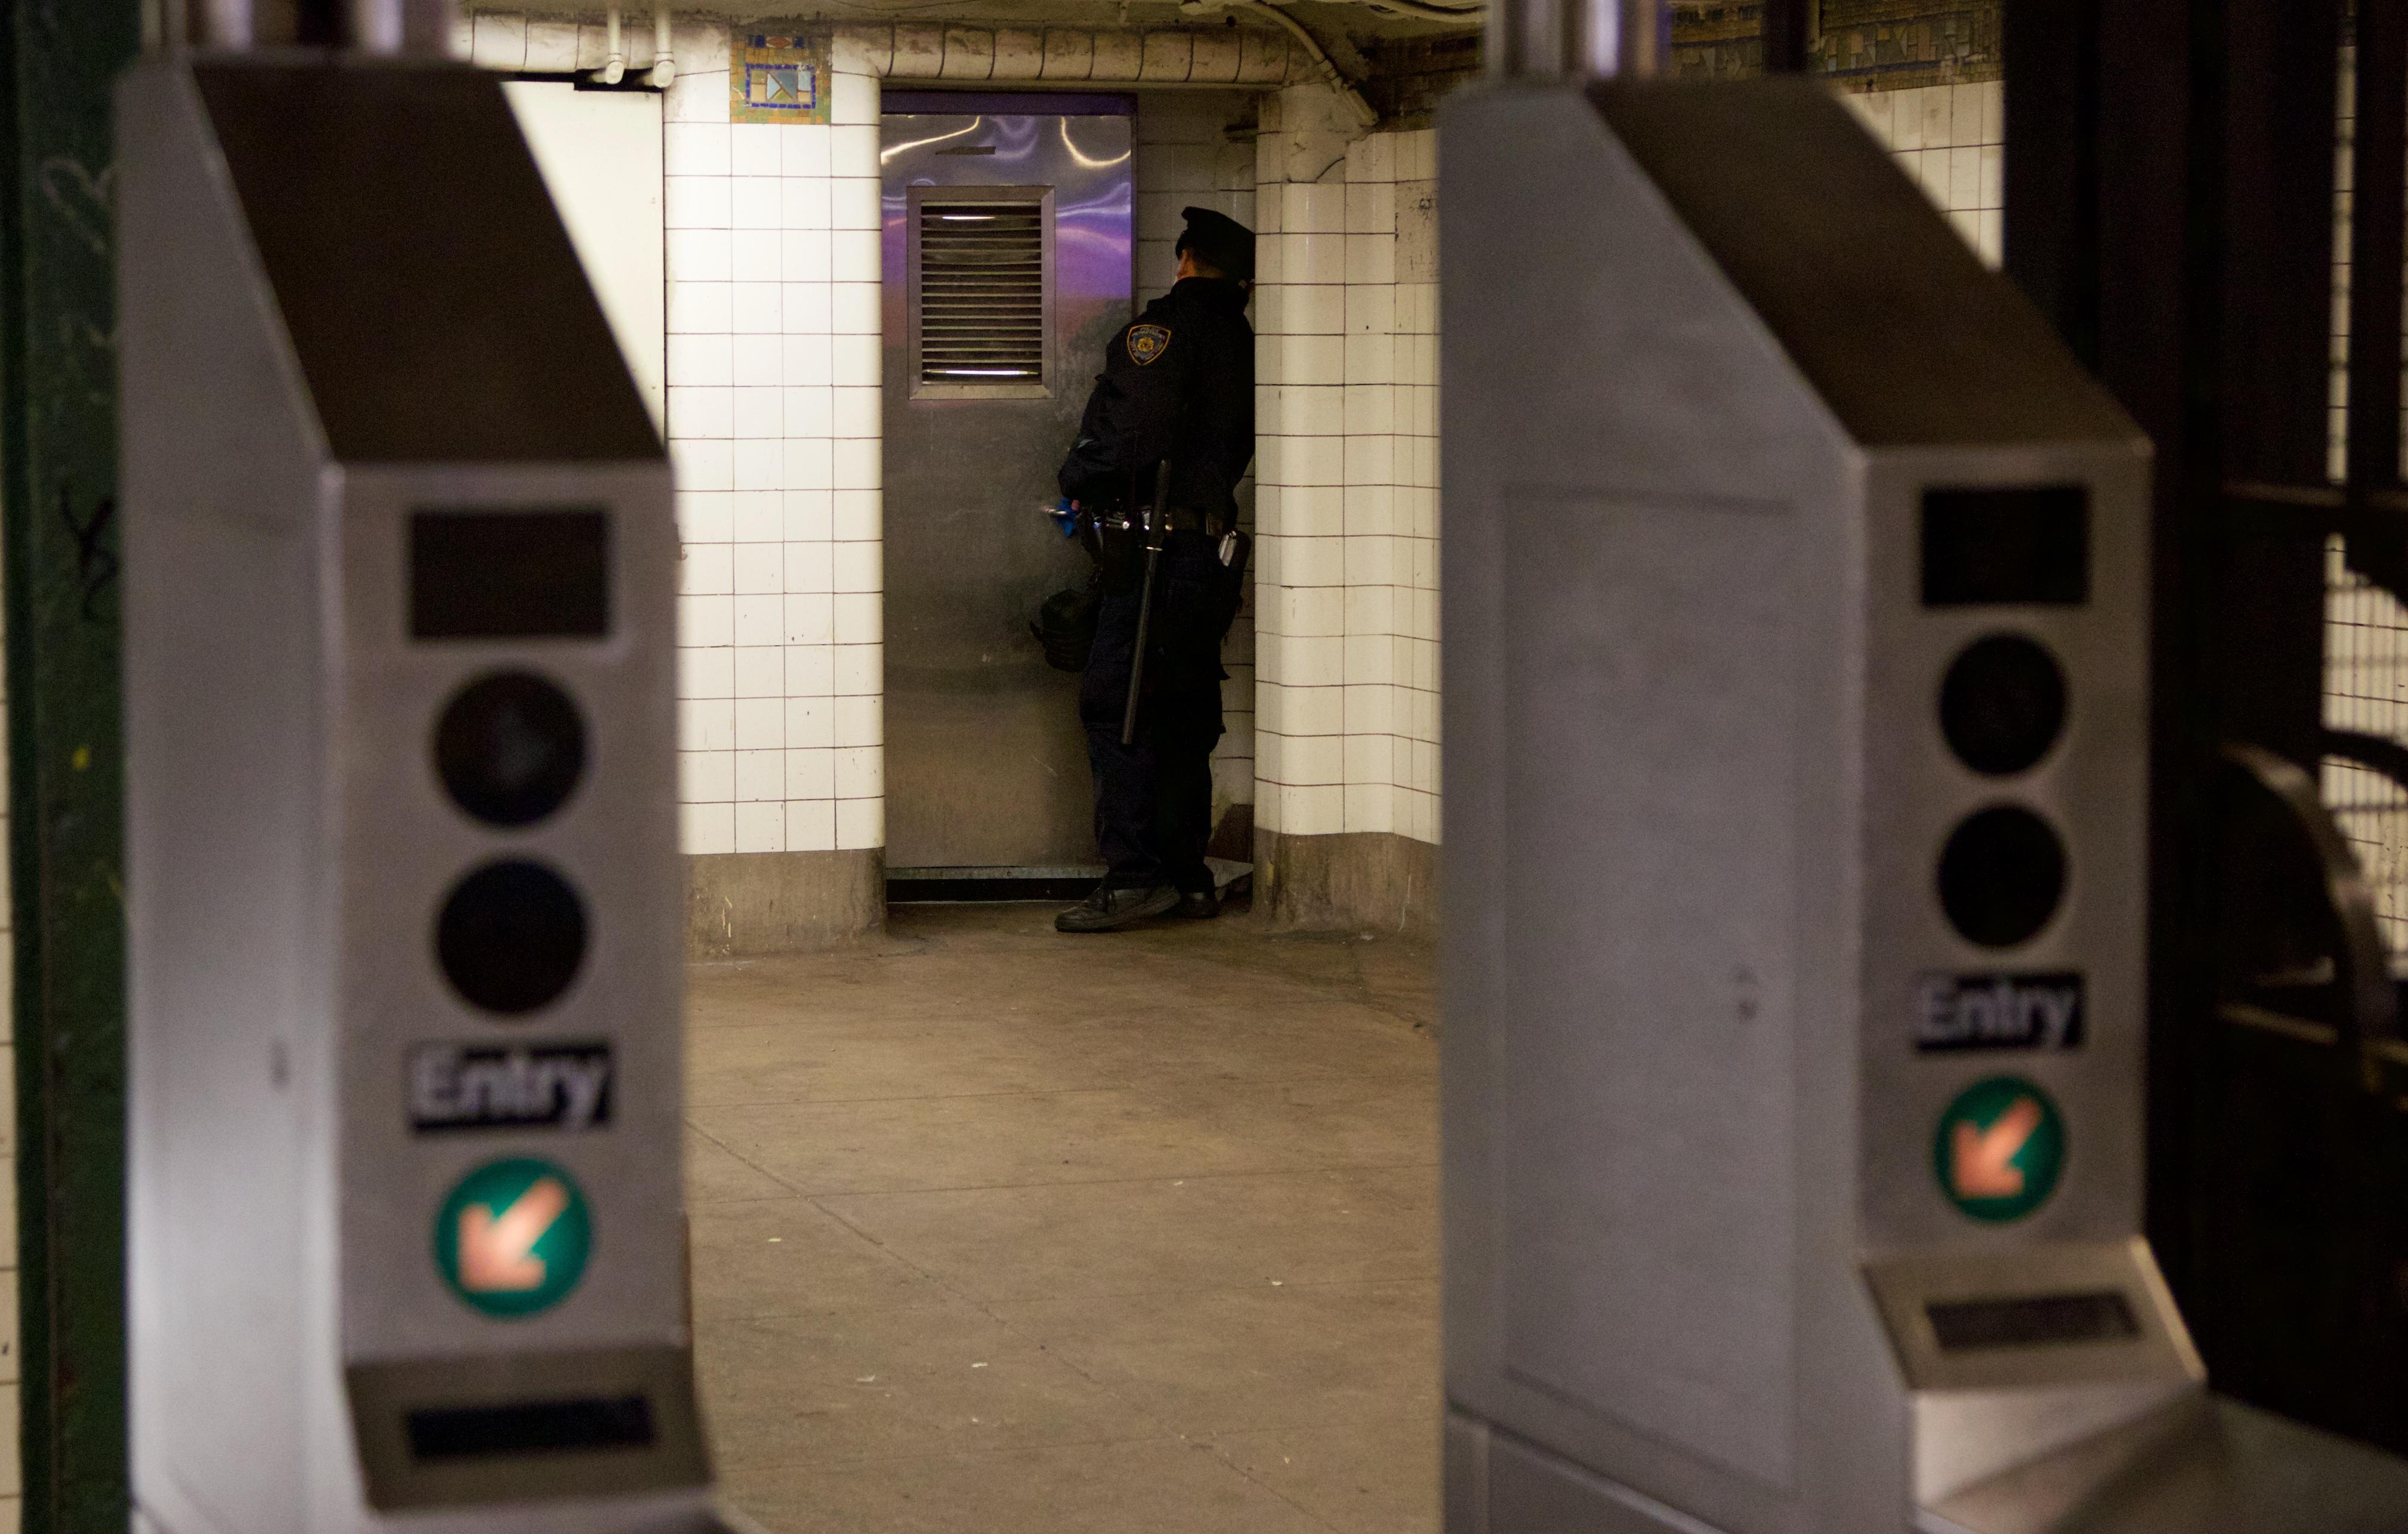 A man was fatally struck by an L train